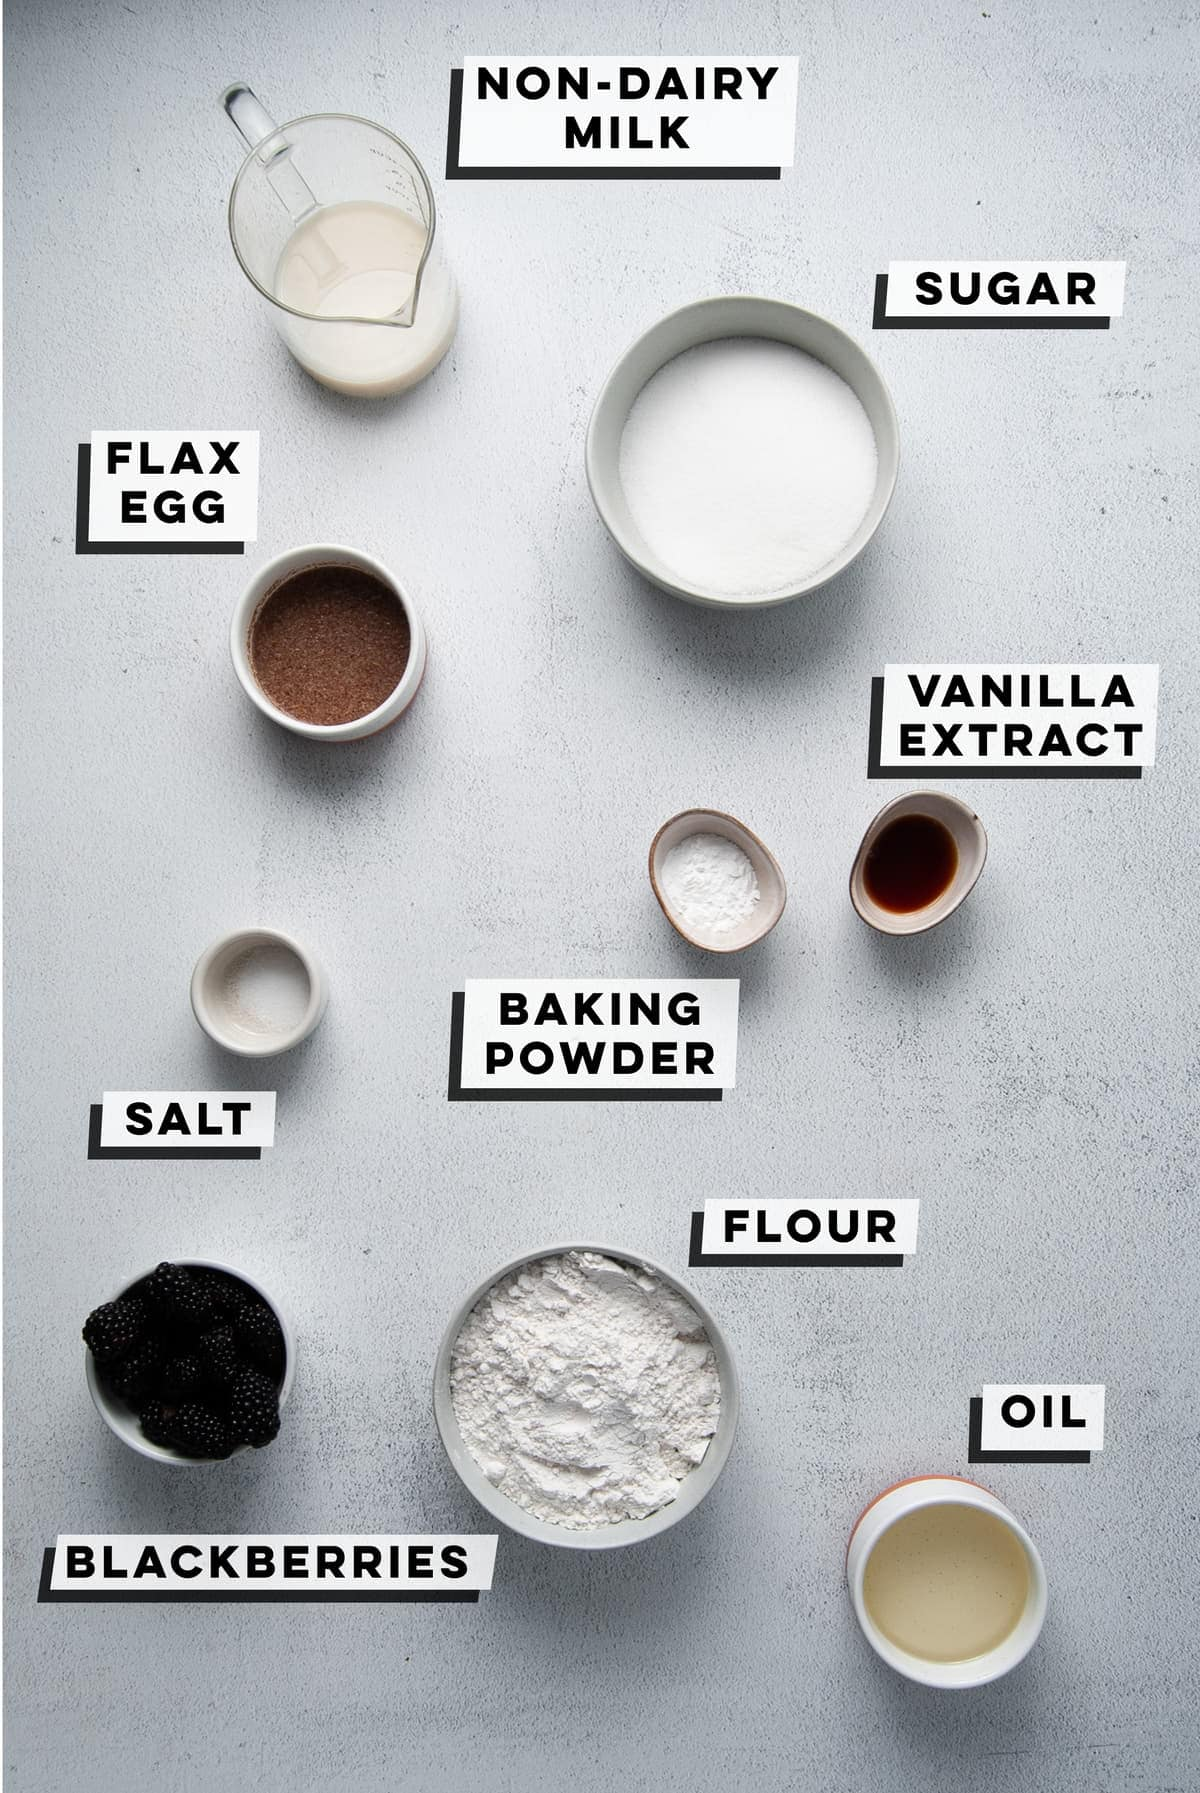 non-dairy milk, sugar, flax egg, baking powder, vanilla extract, salt, blackberries, flour, oil